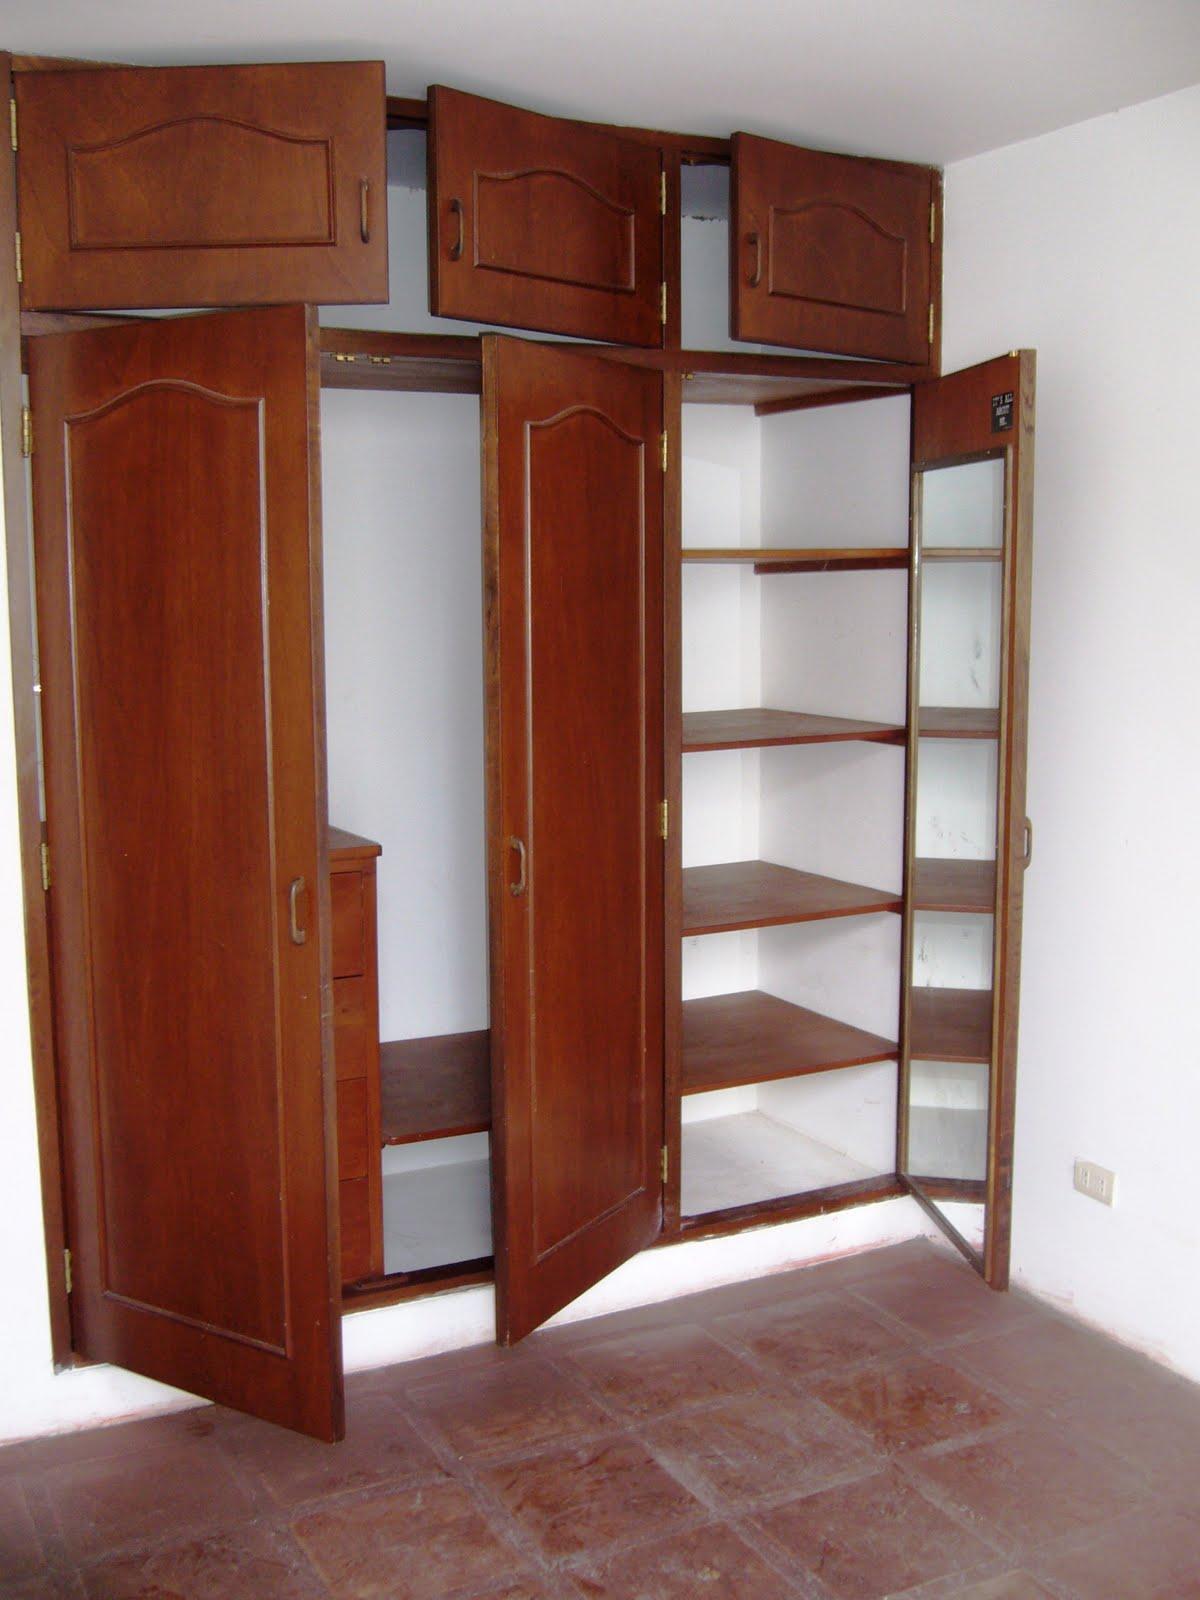 EBANINSAINDUSTRIAL S A Closet